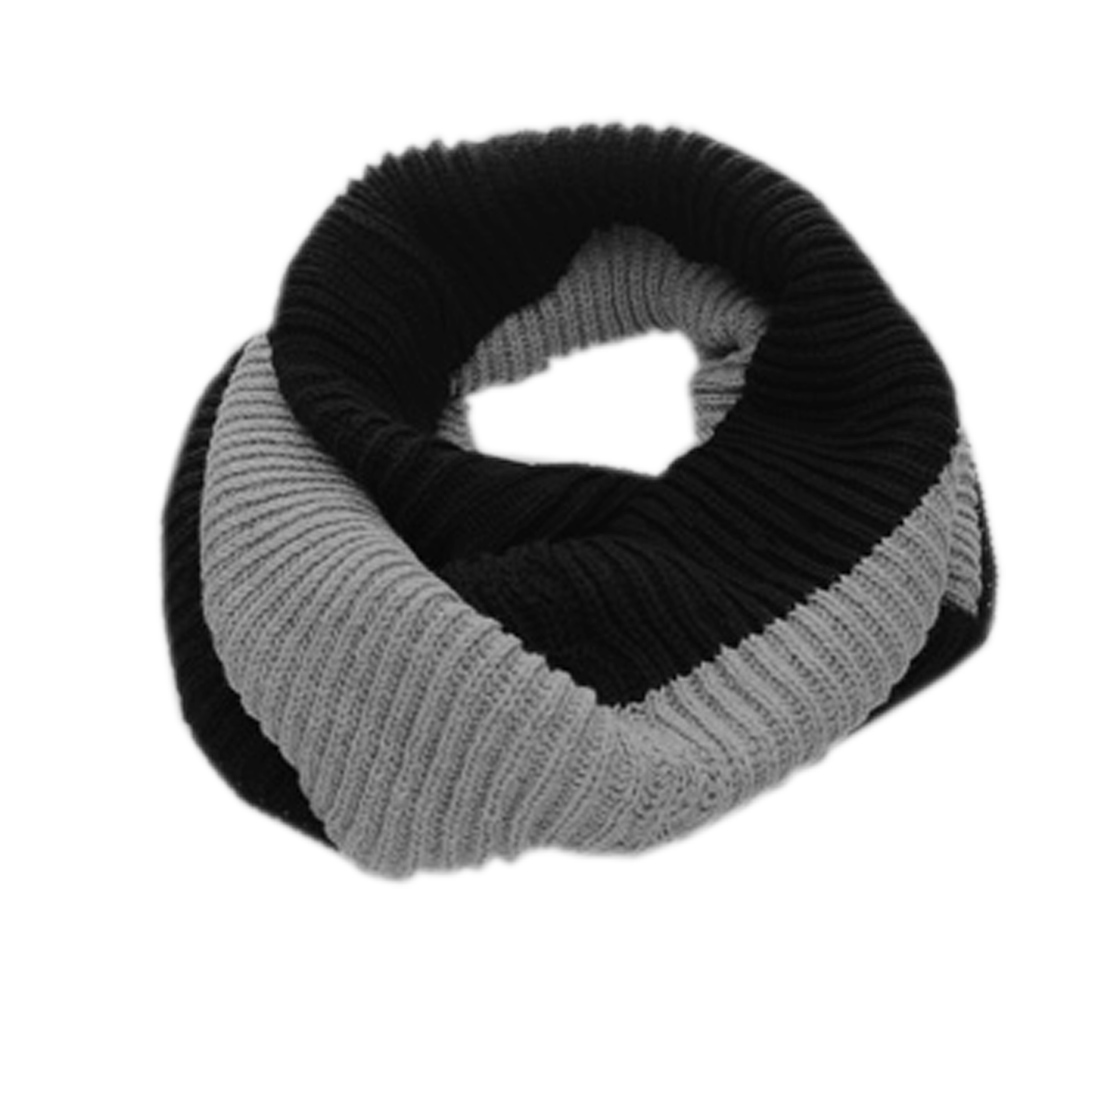 1606 D345 Mens Black Gray Stripe Pattern Ribbed Knitting Patchwork ...